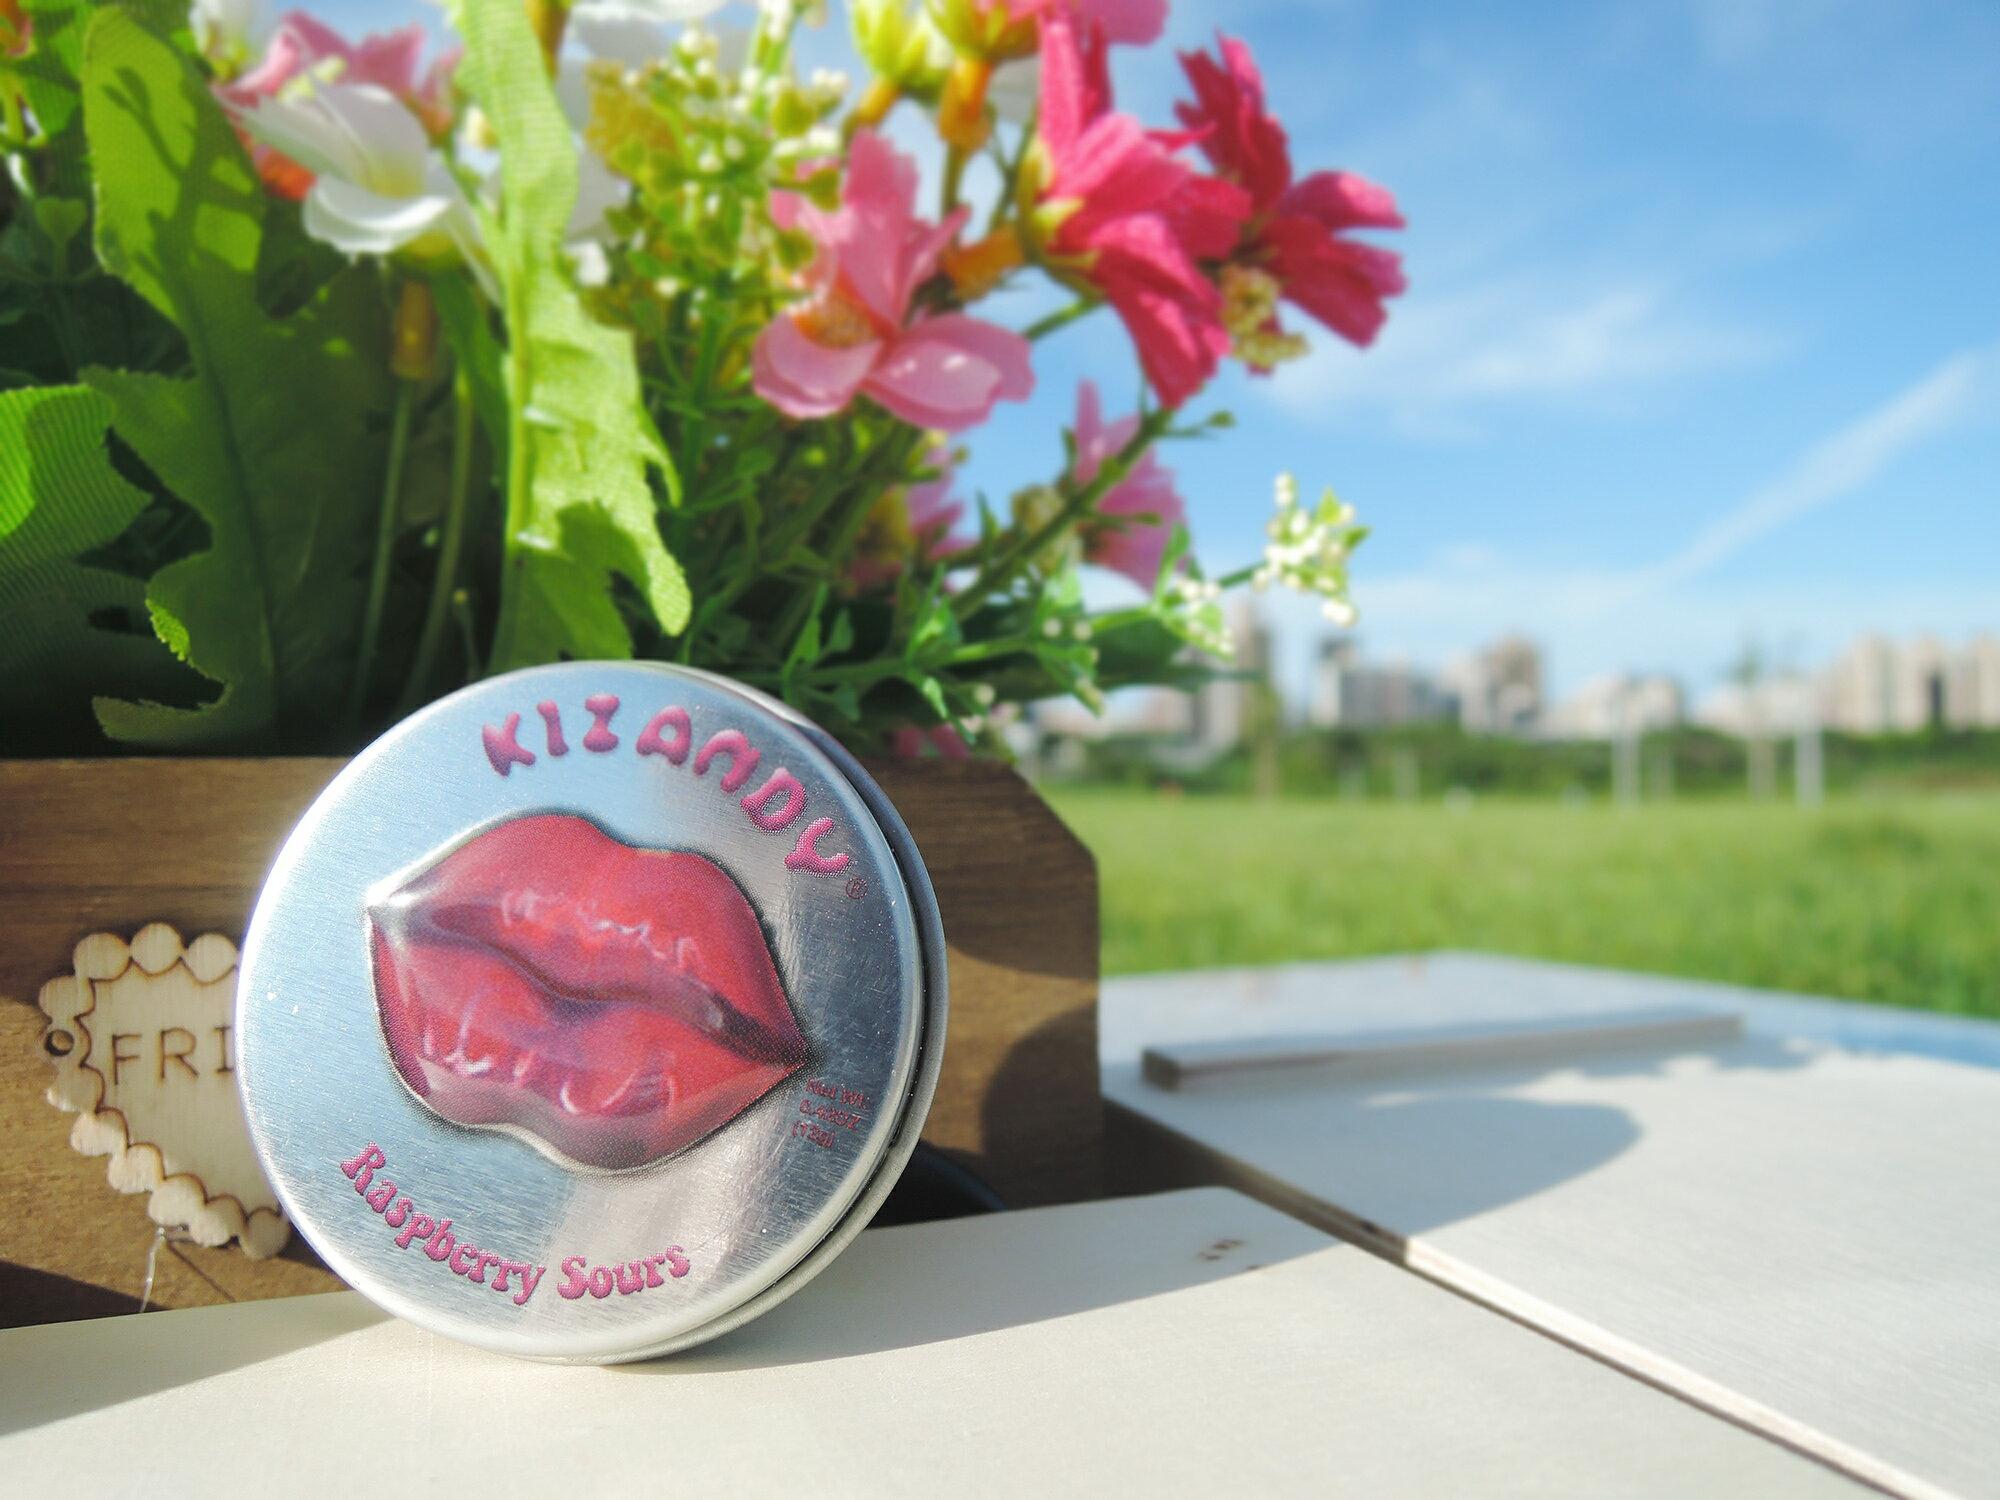 【Kizandy】香吻繽紛觸電糖-覆盆子口味迷你版 婚禮小物